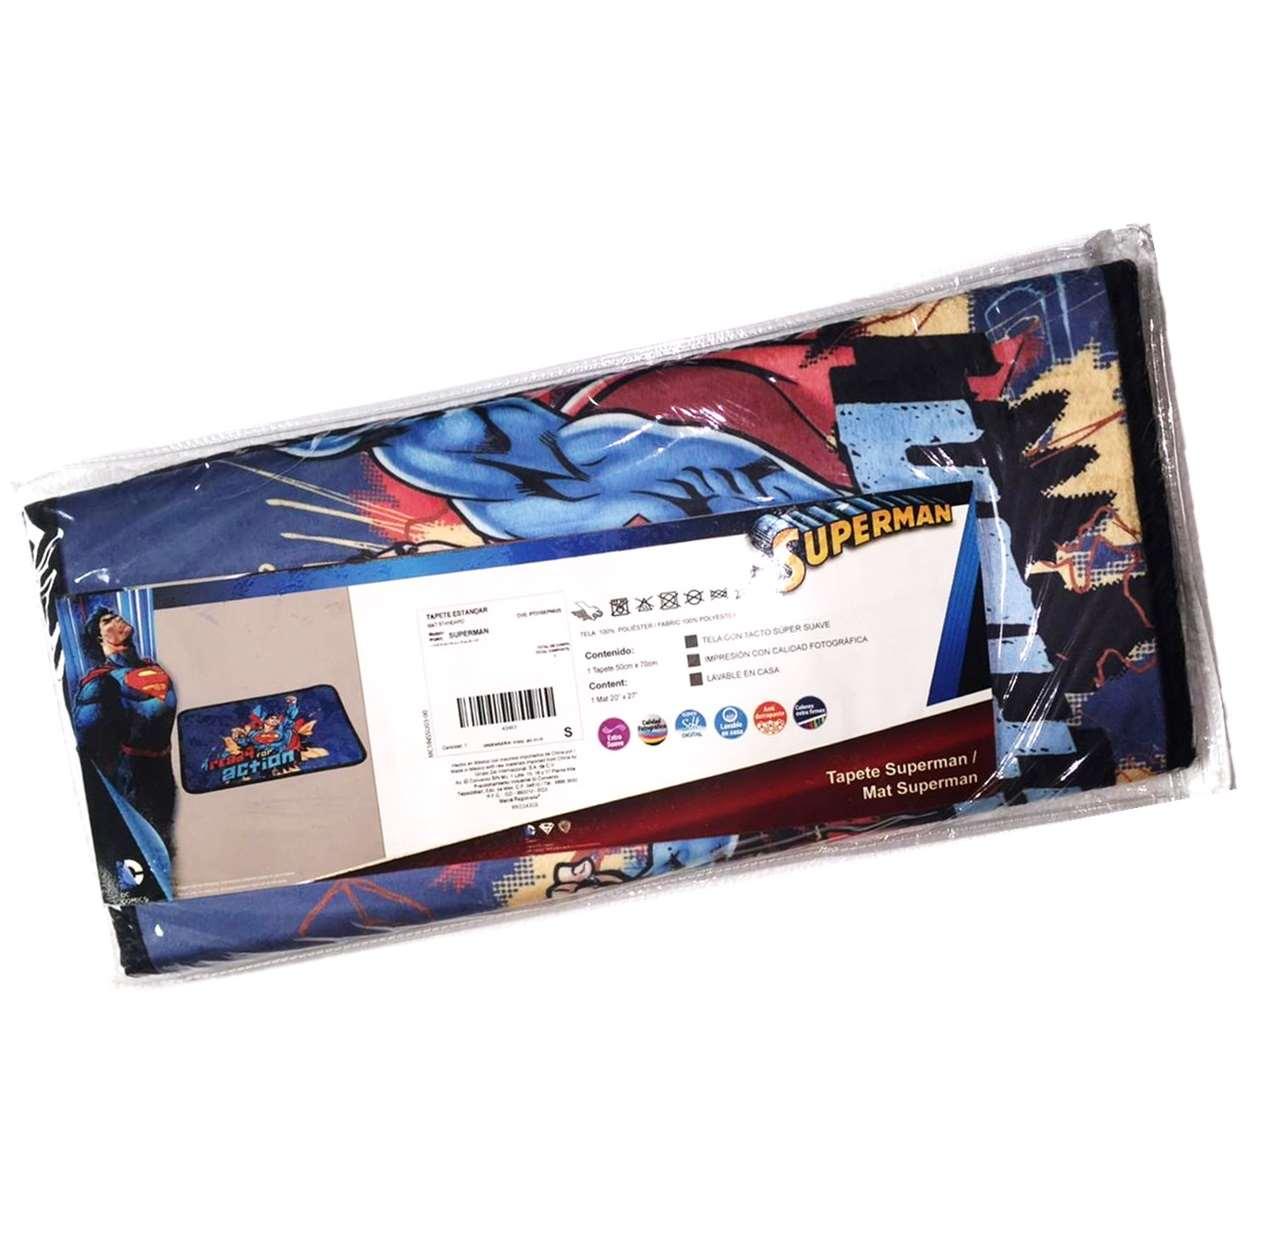 Tapete Standard Multicolor Dc Superman Intima Hogar 50x70cm